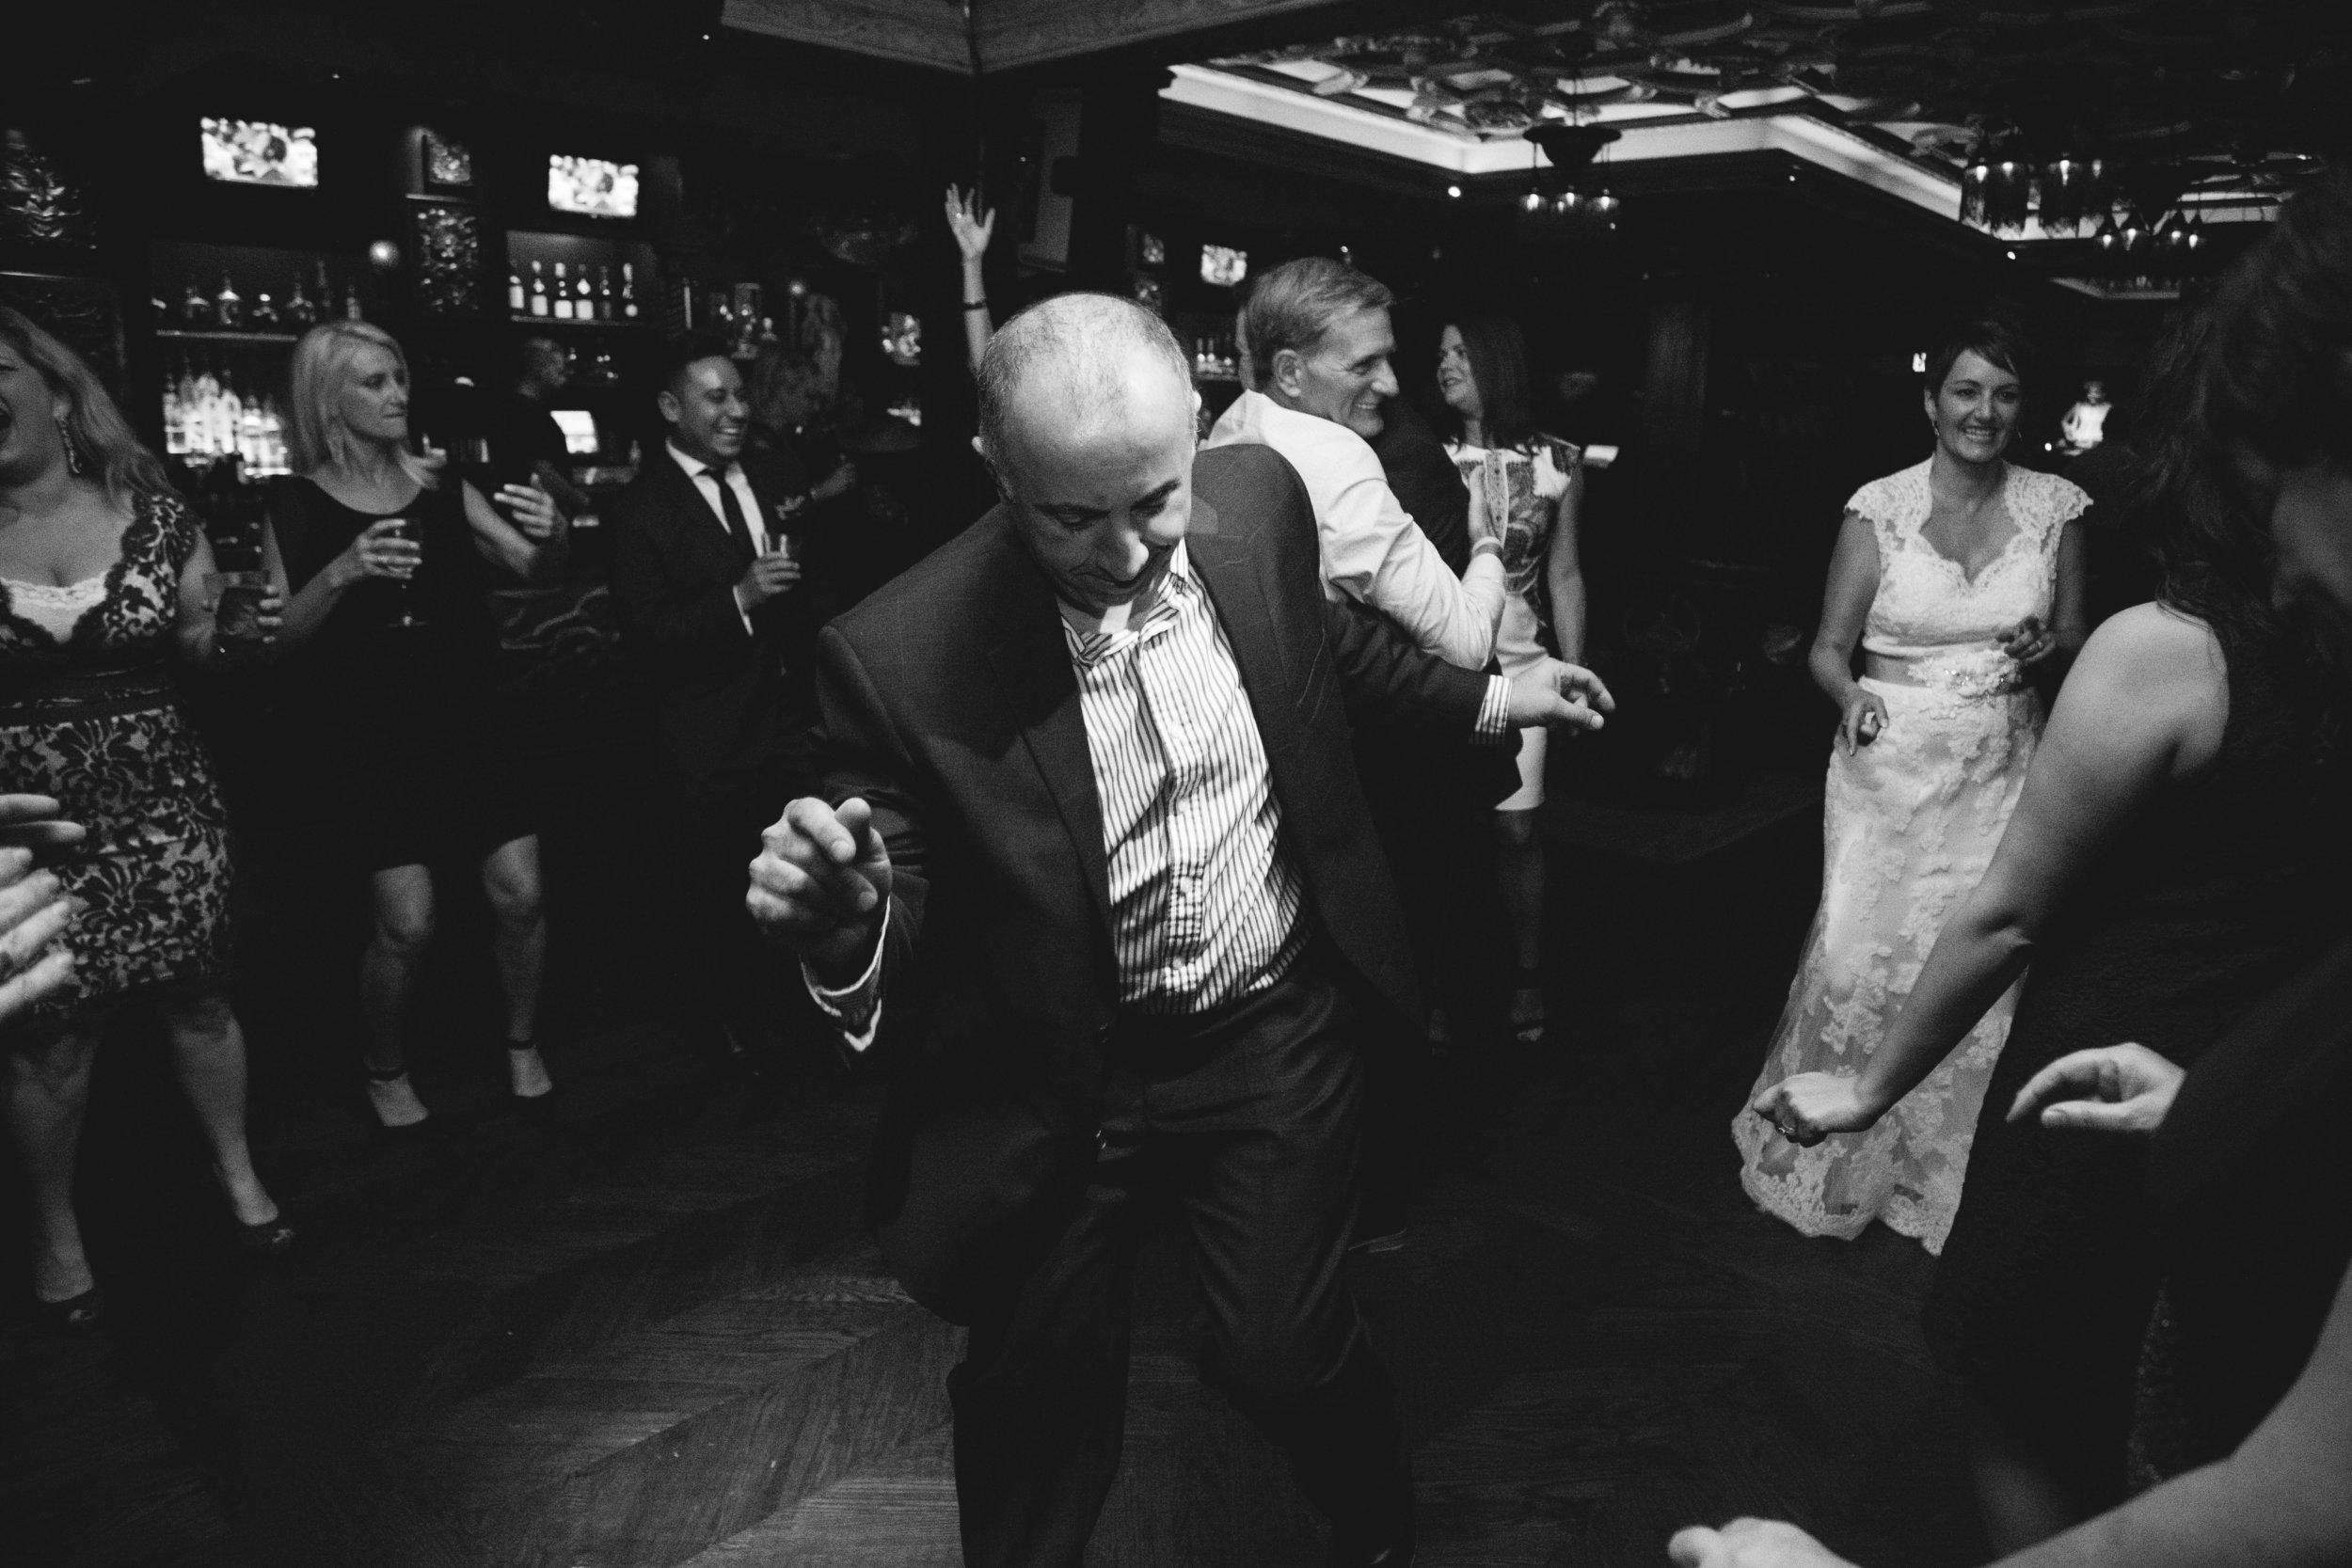 ATGI_Kat and Gabe Wedding 2016_2S8A6210.jpg